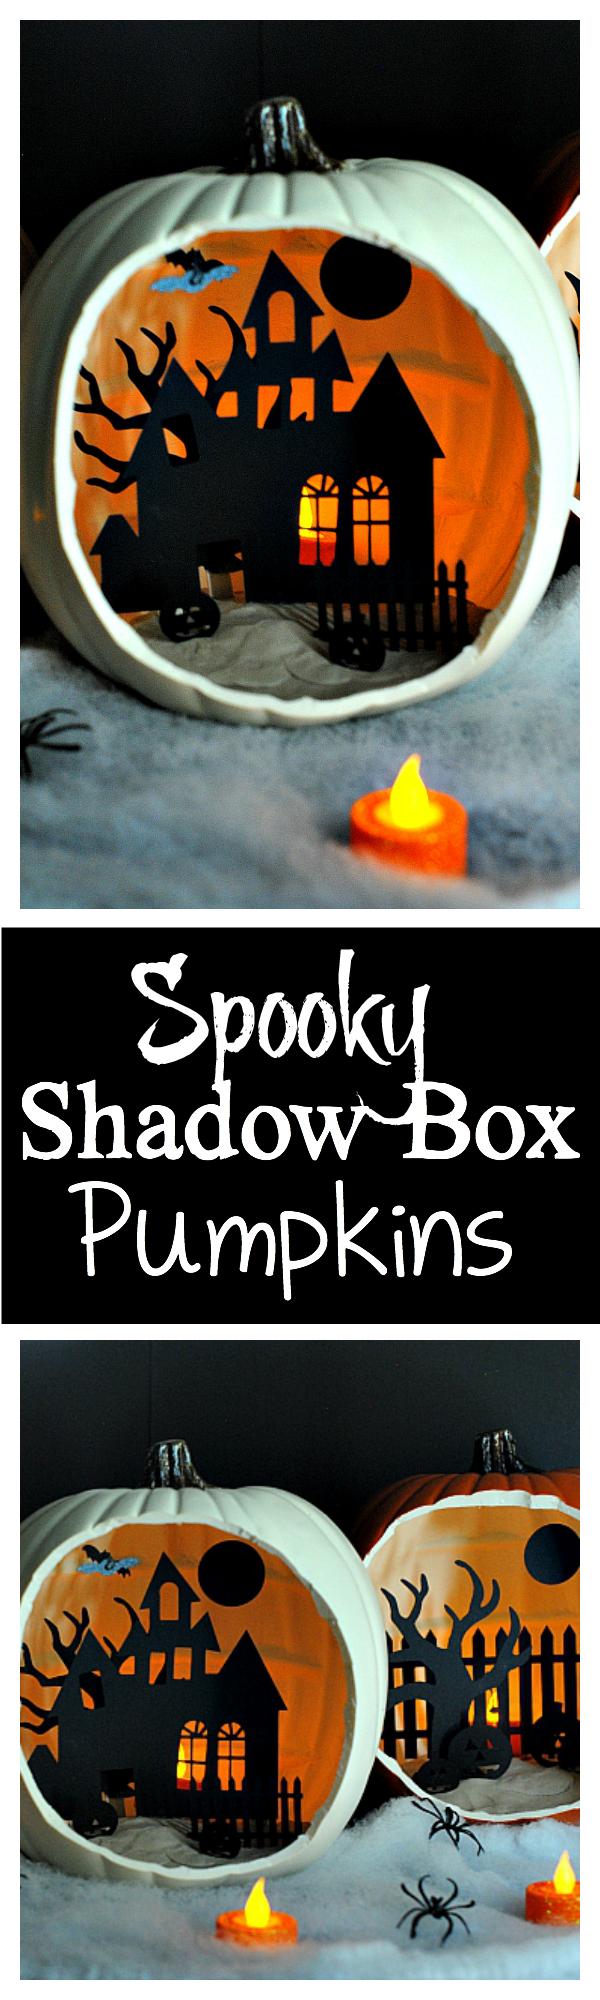 Great Halloween Decoration-Shadow Box Pumpkins